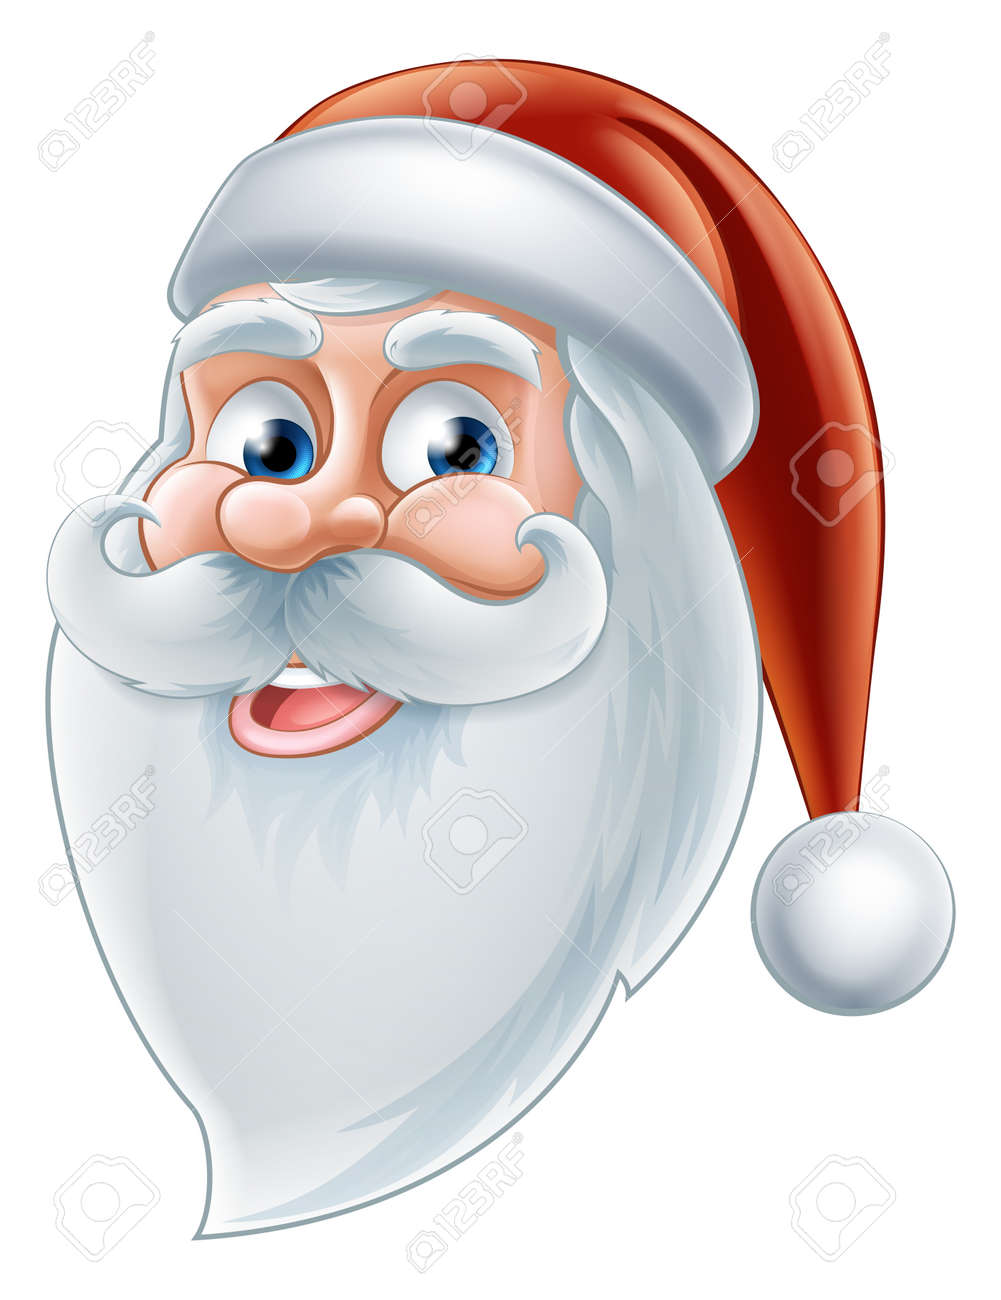 Cartoon Santa Face : cartoon, santa, Illustration, Christmas, Cartoon, Happy, Santa, Royalty, Cliparts,, Vectors,, Stock, Illustration., Image, 32611921.